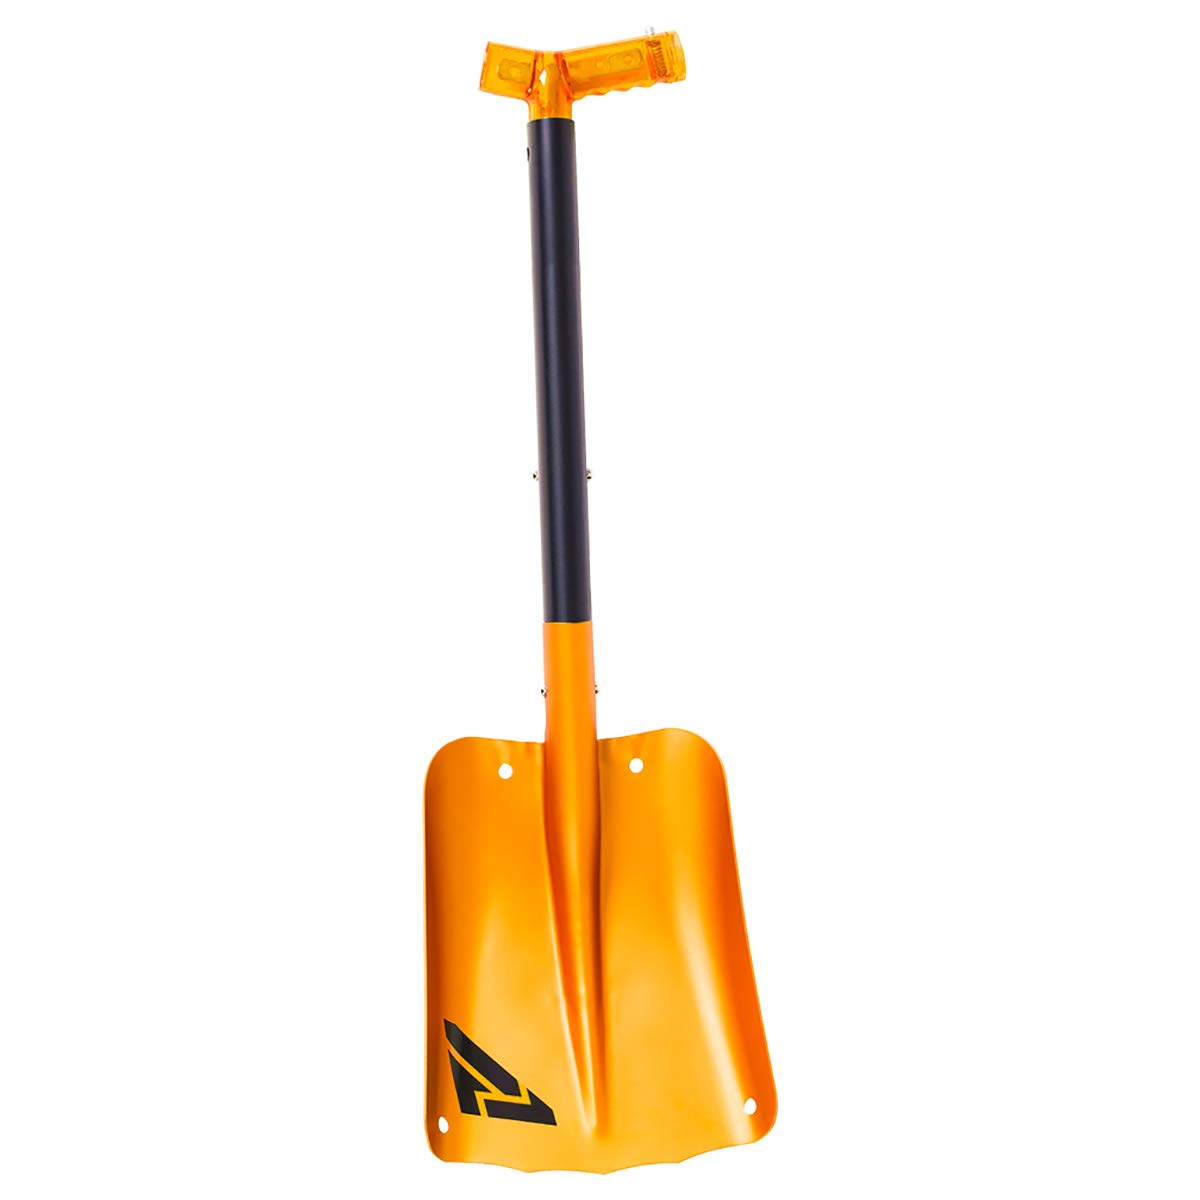 FXR Tactic Shovel オレンジ 15717.30100 B07L1DF3CQ オレンジ/ブラック